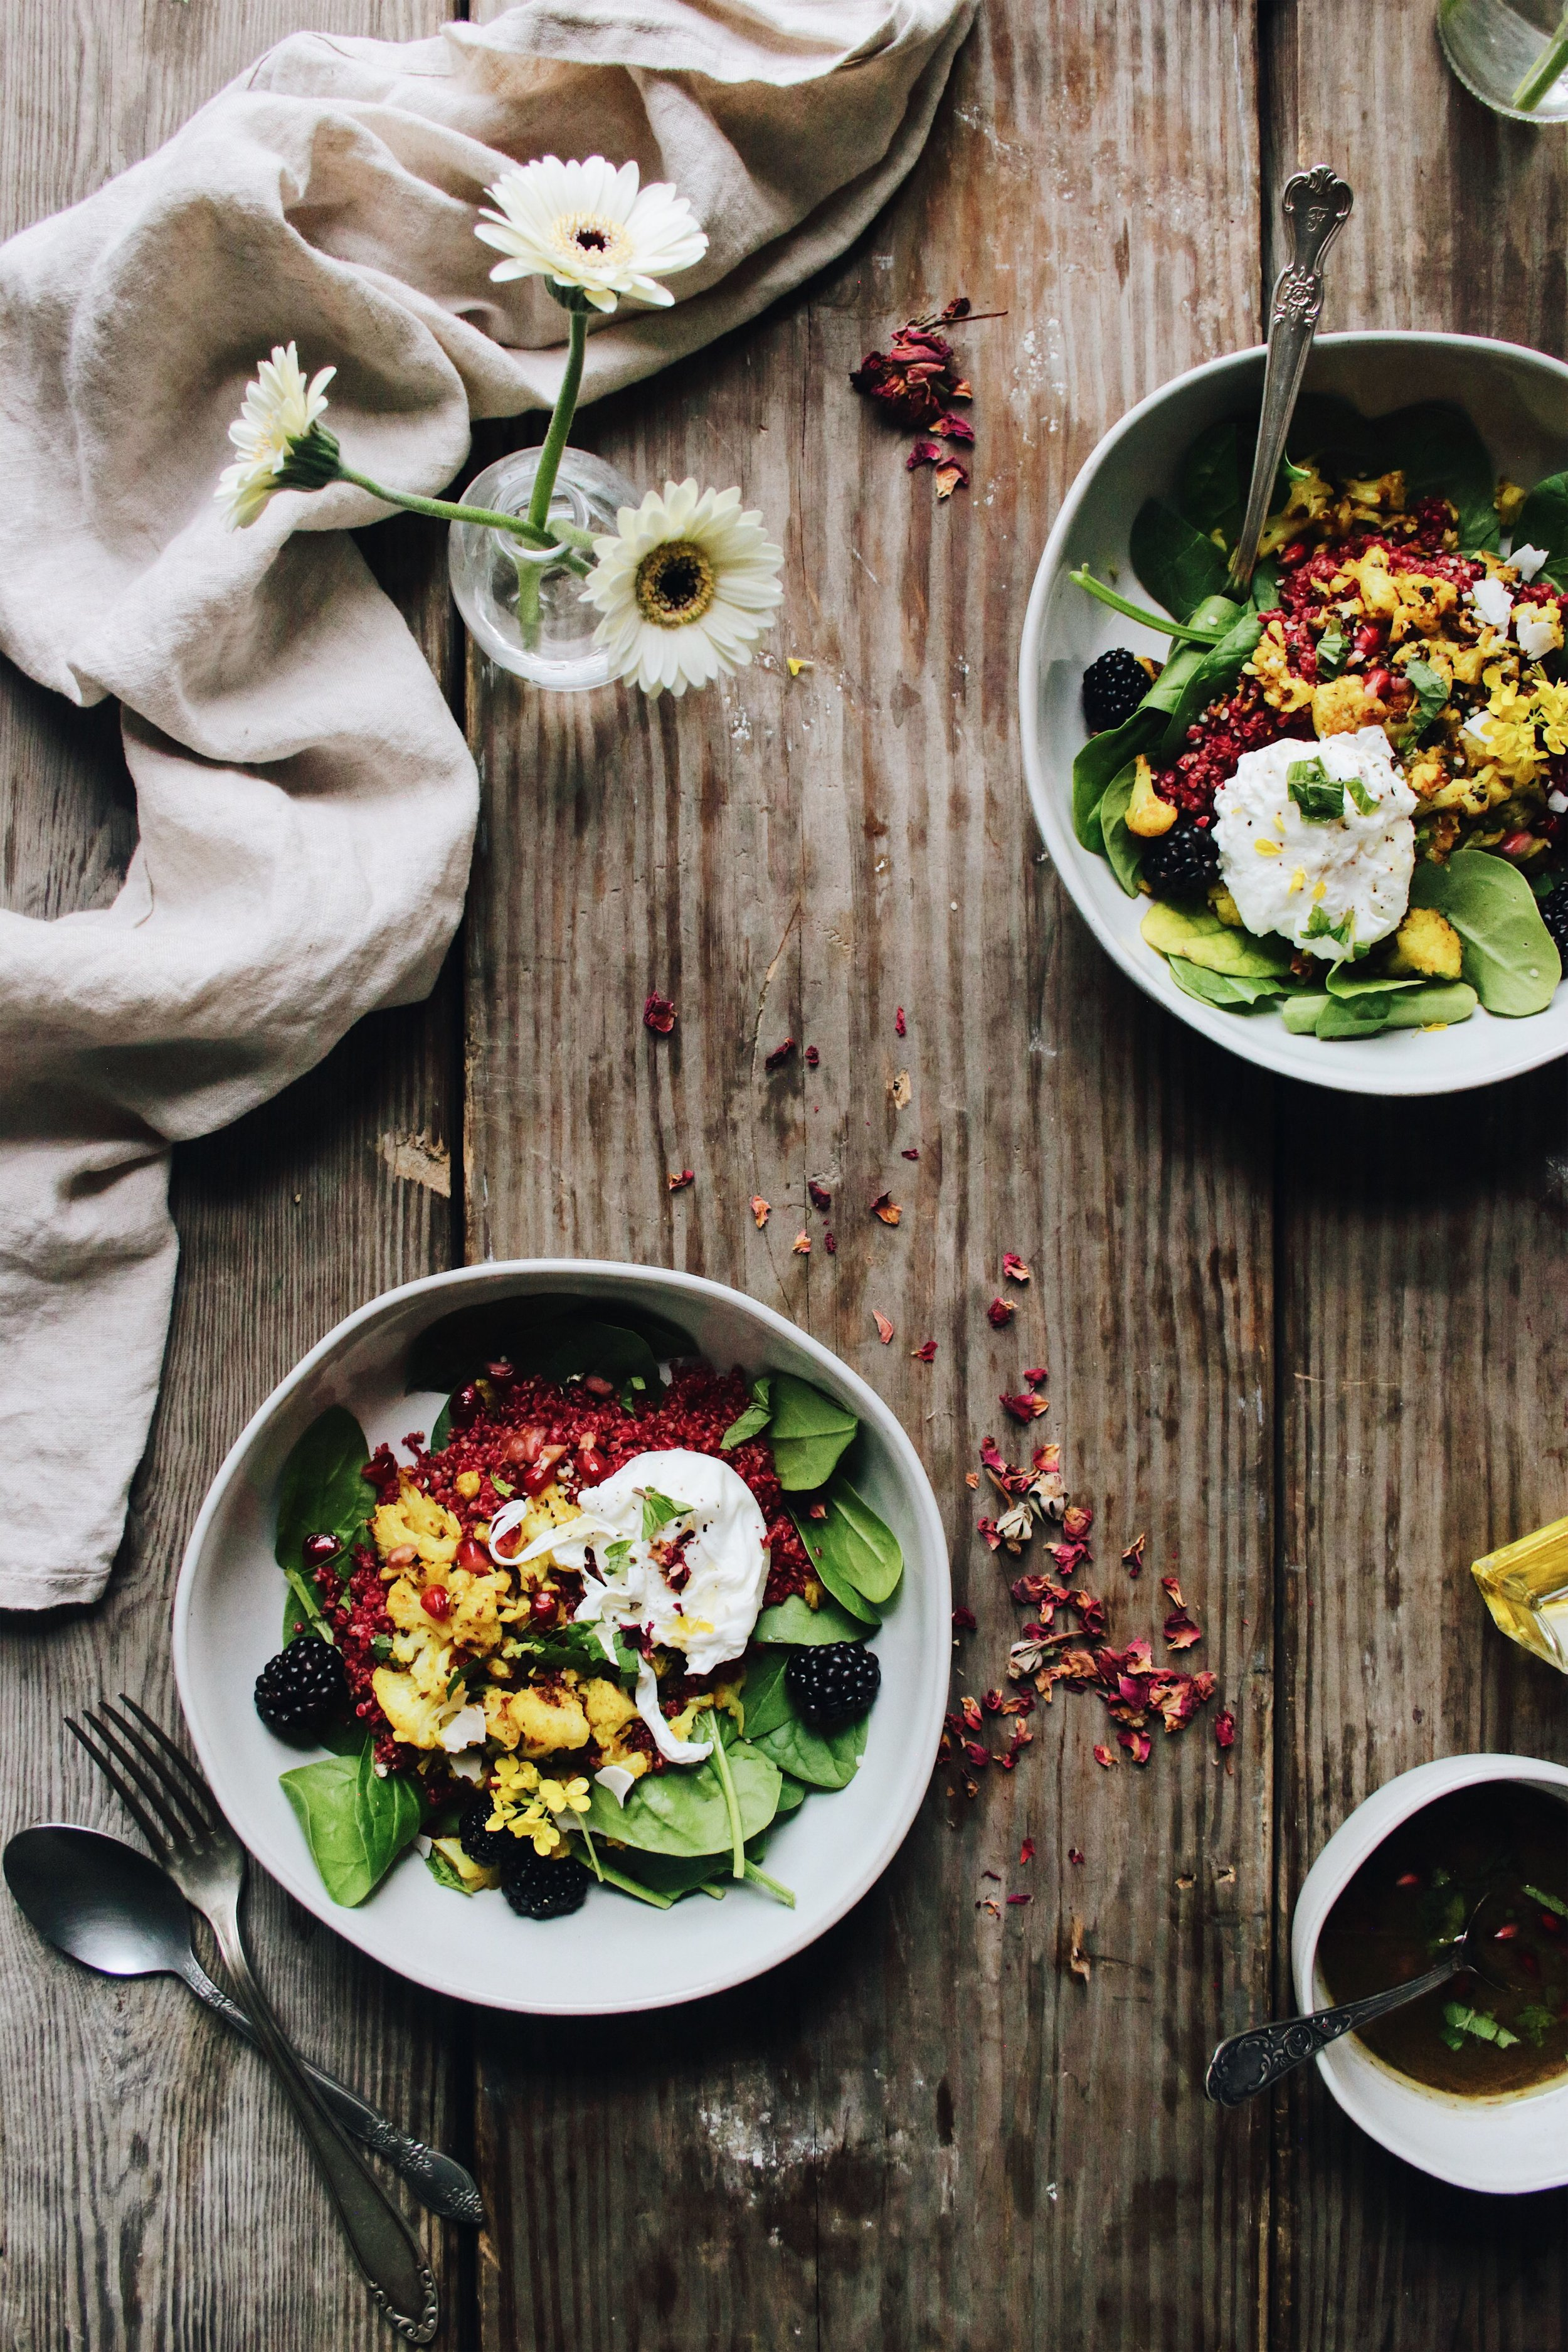 beet quinoa spinachbreakfast bowl - Eat like a rainbow